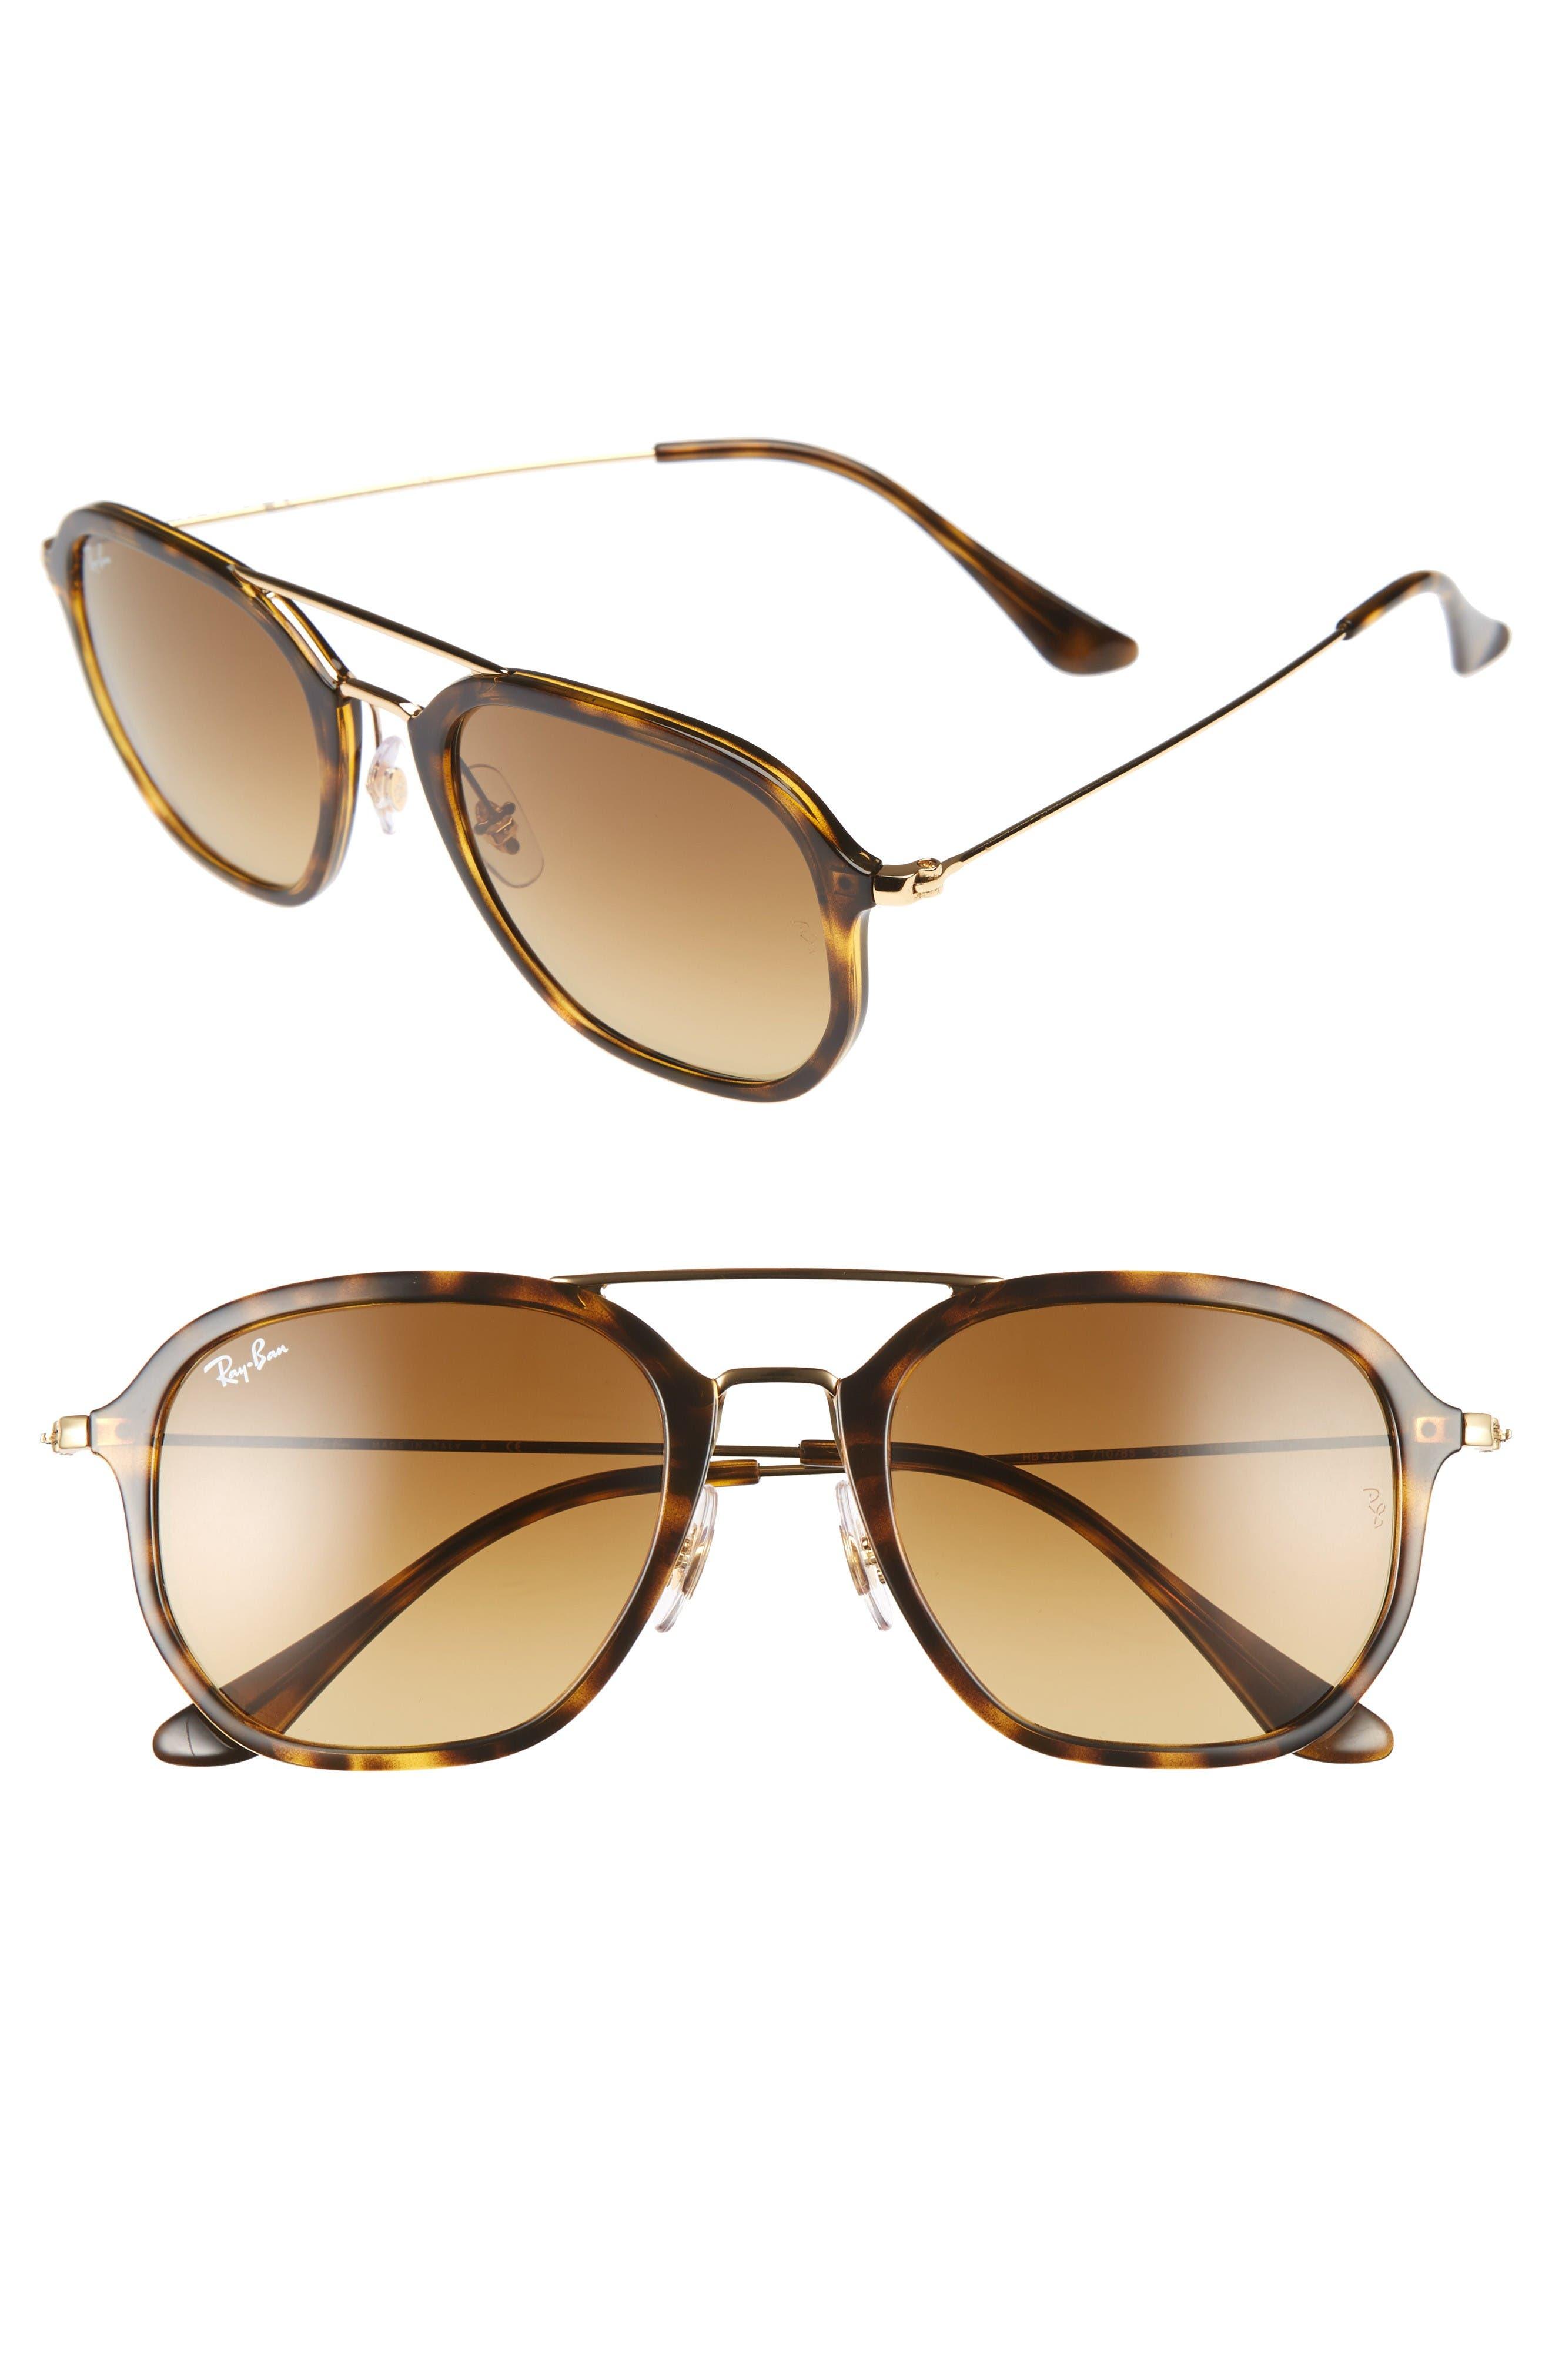 52mm Square Sunglasses,                             Main thumbnail 1, color,                             Havana